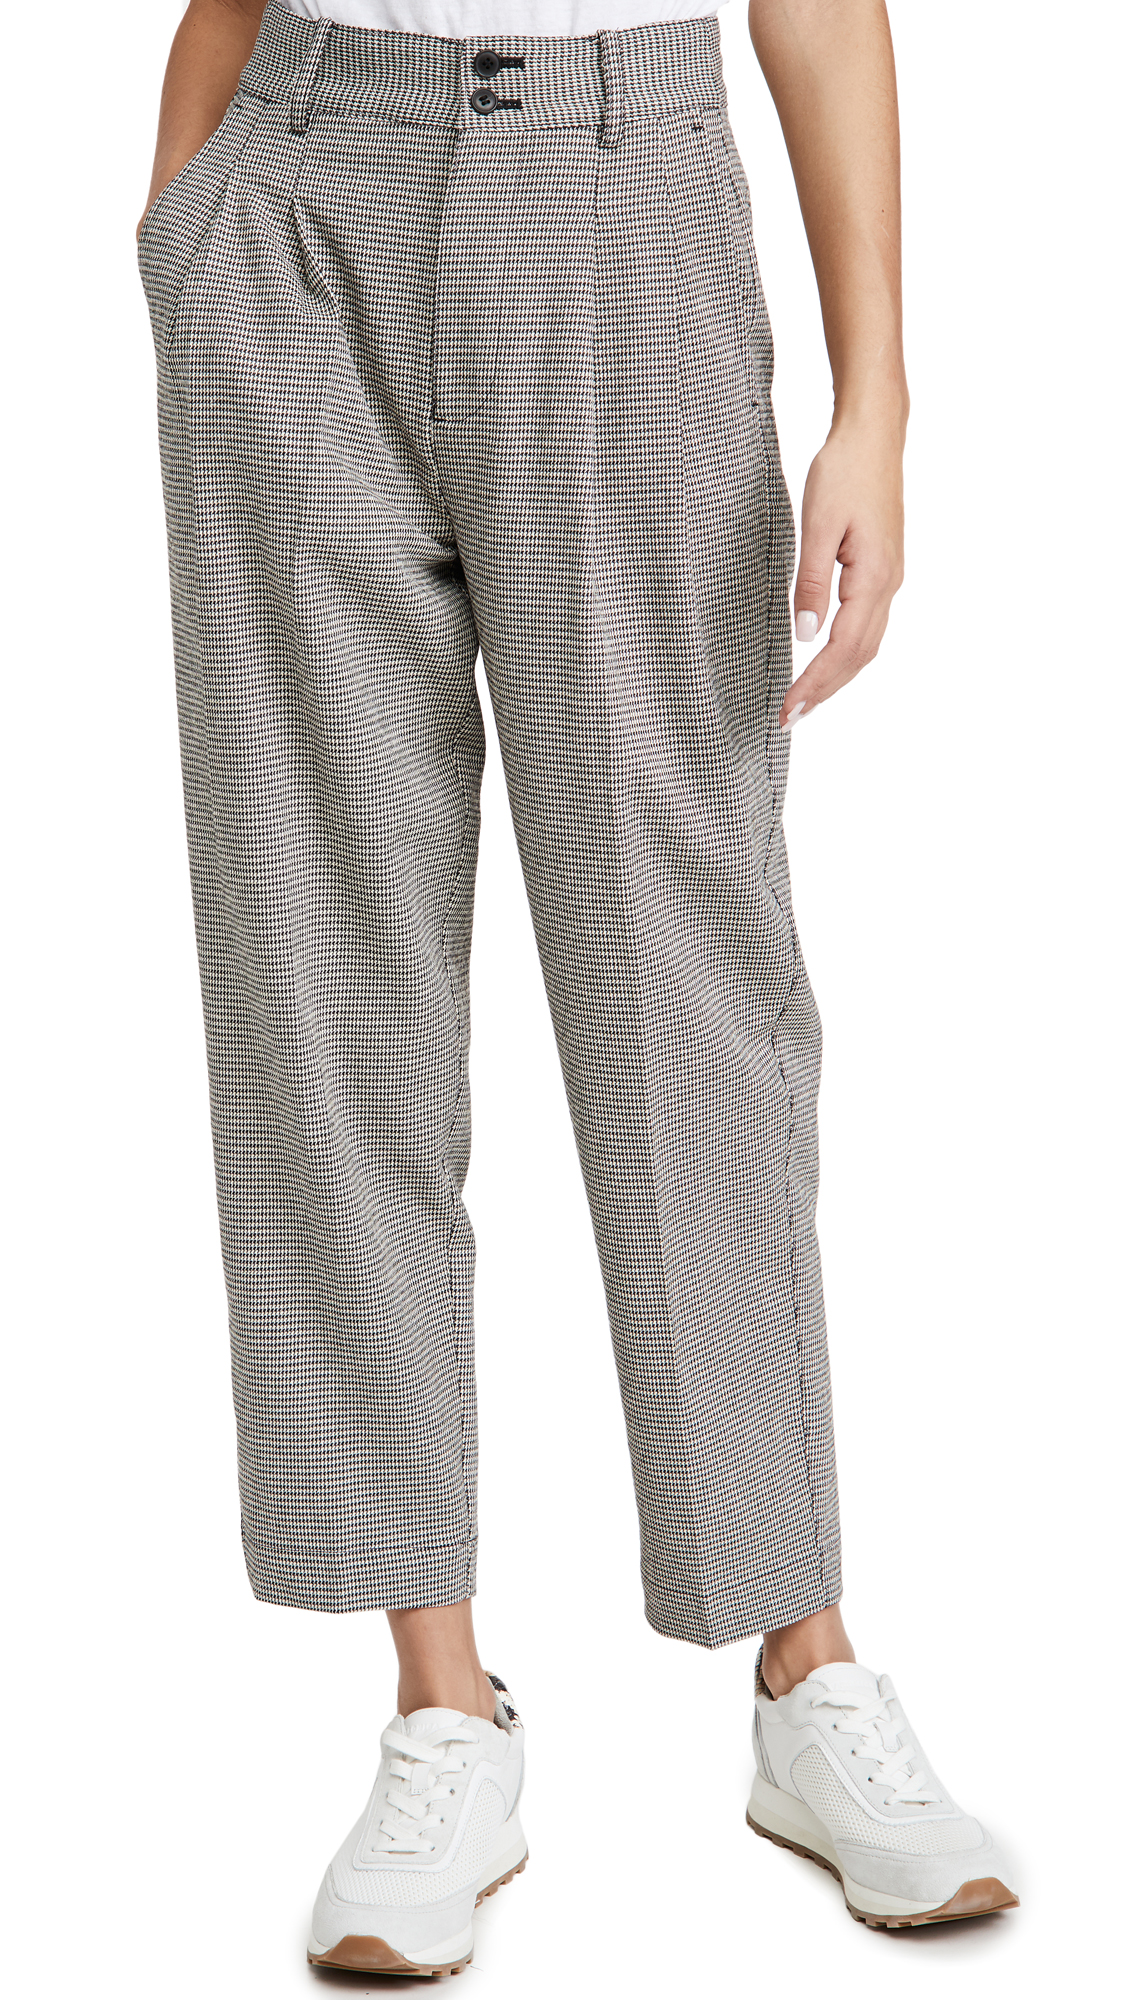 Madewell Tapered Pleated Wide Leg Pants